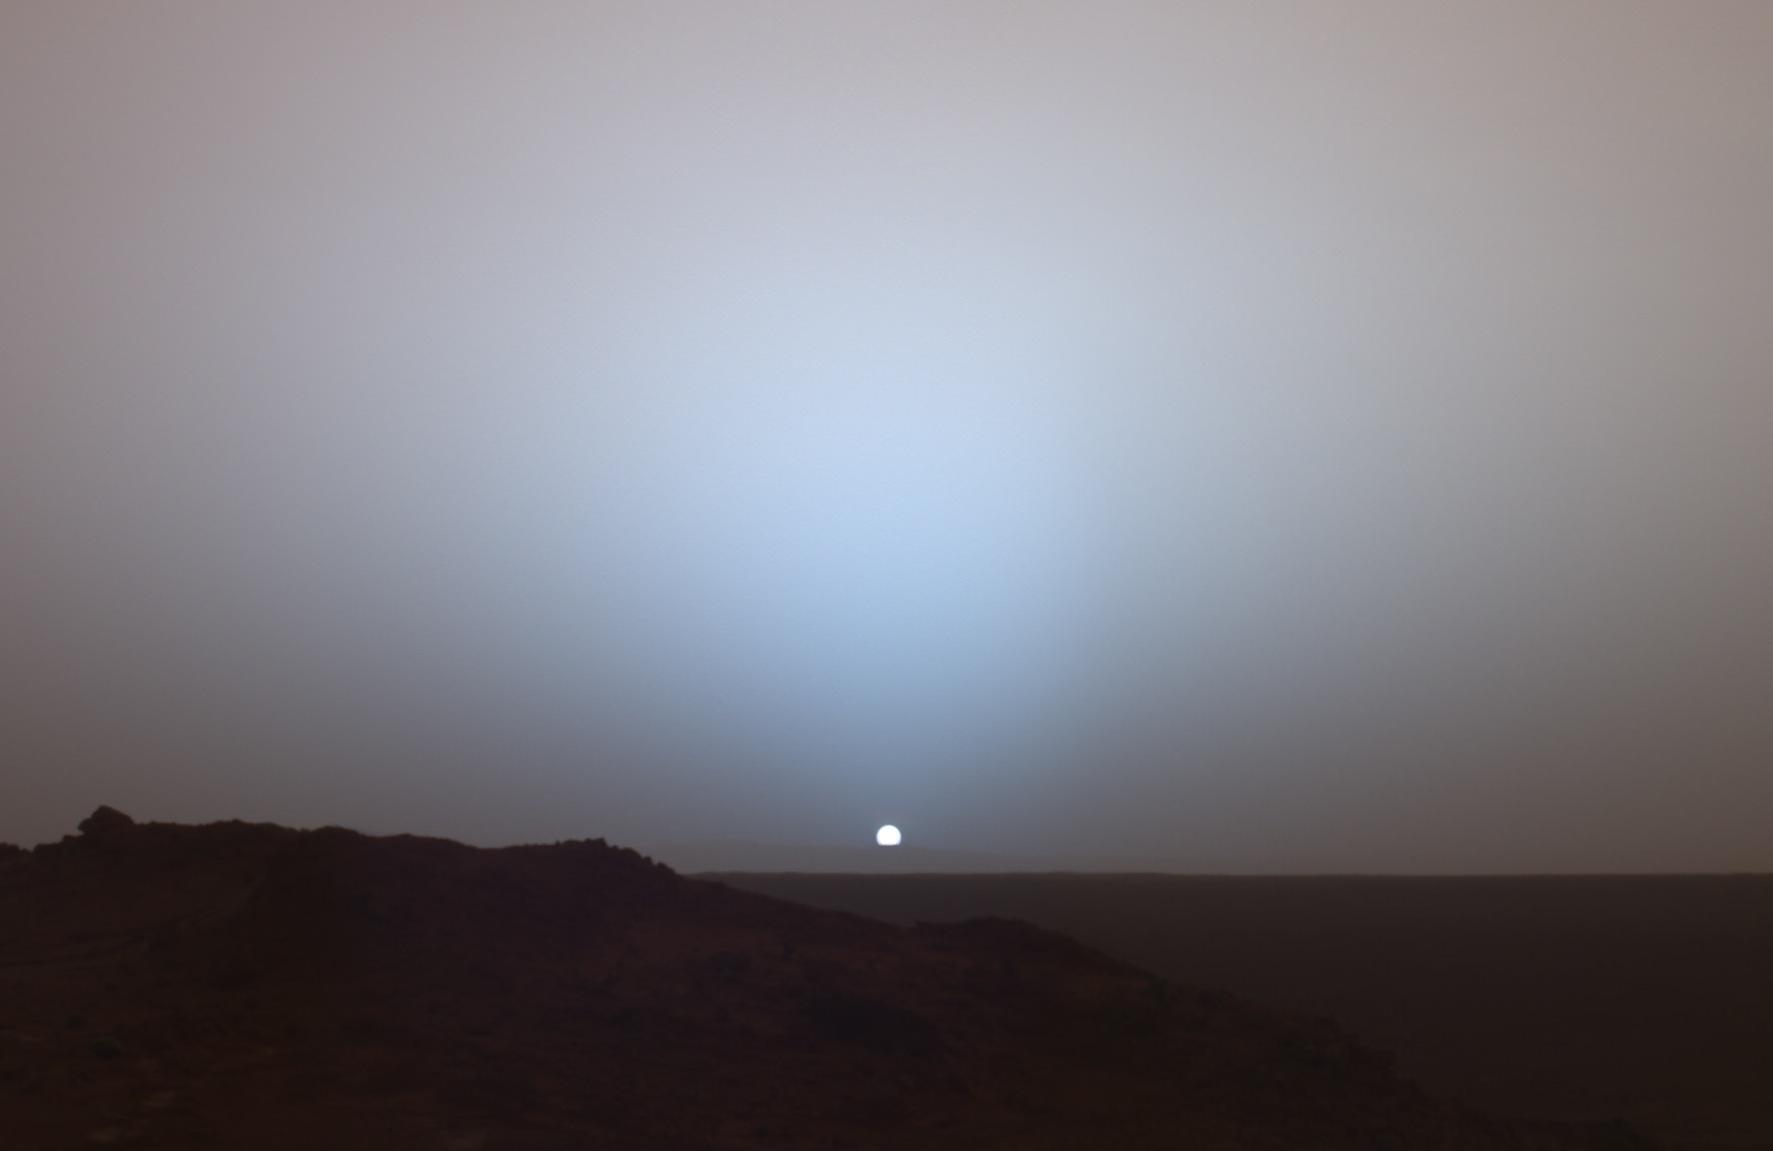 mars rover ultimo mensaje - photo #43